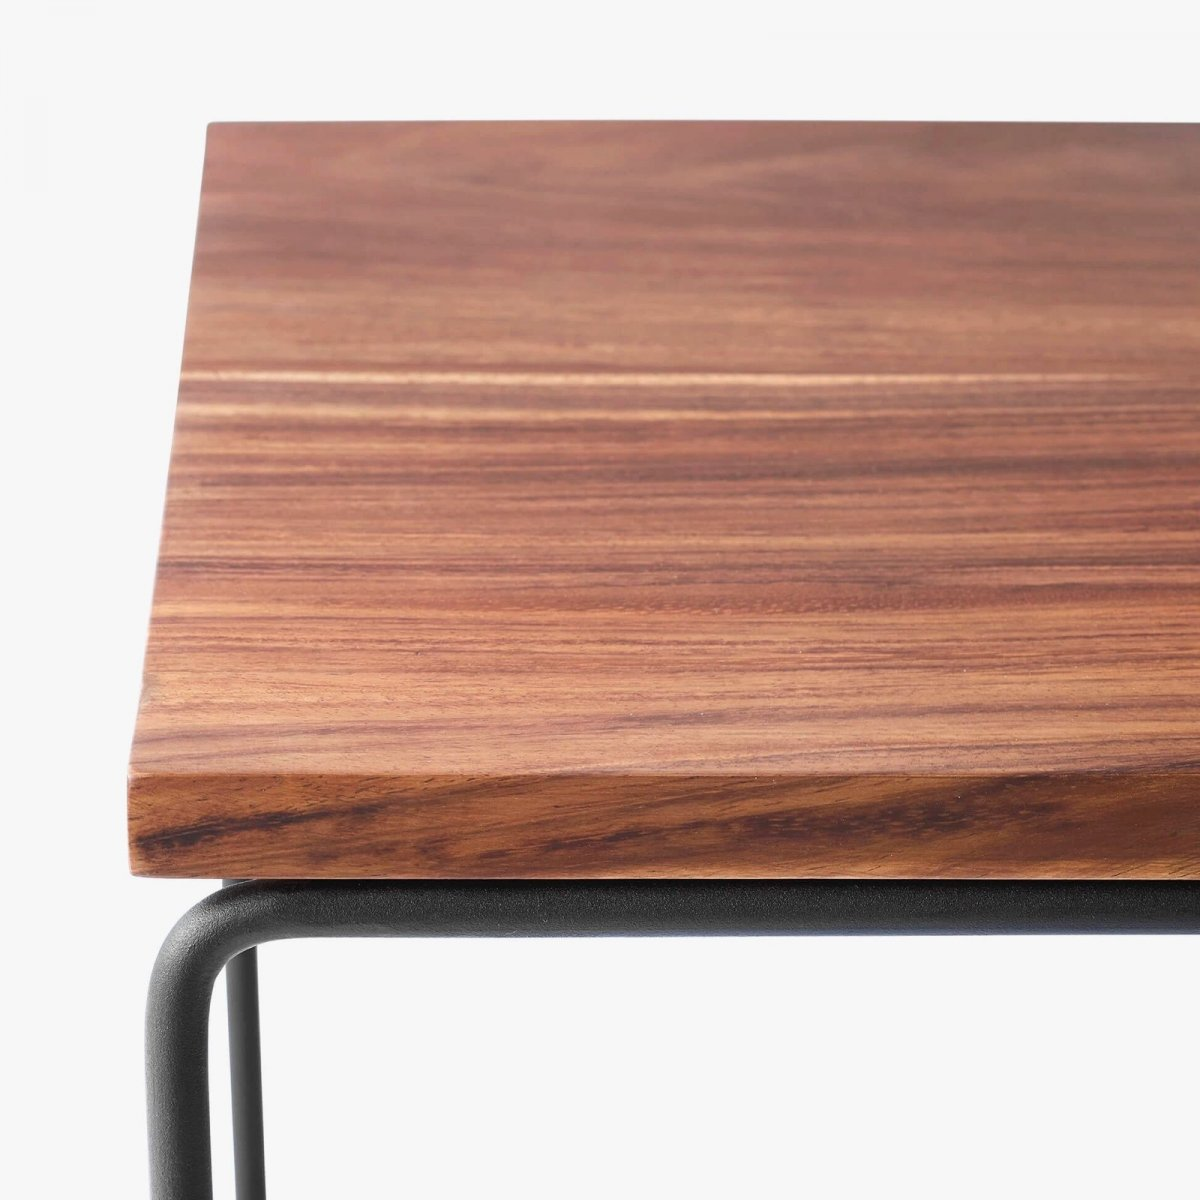 Centro Modular Table, detail.